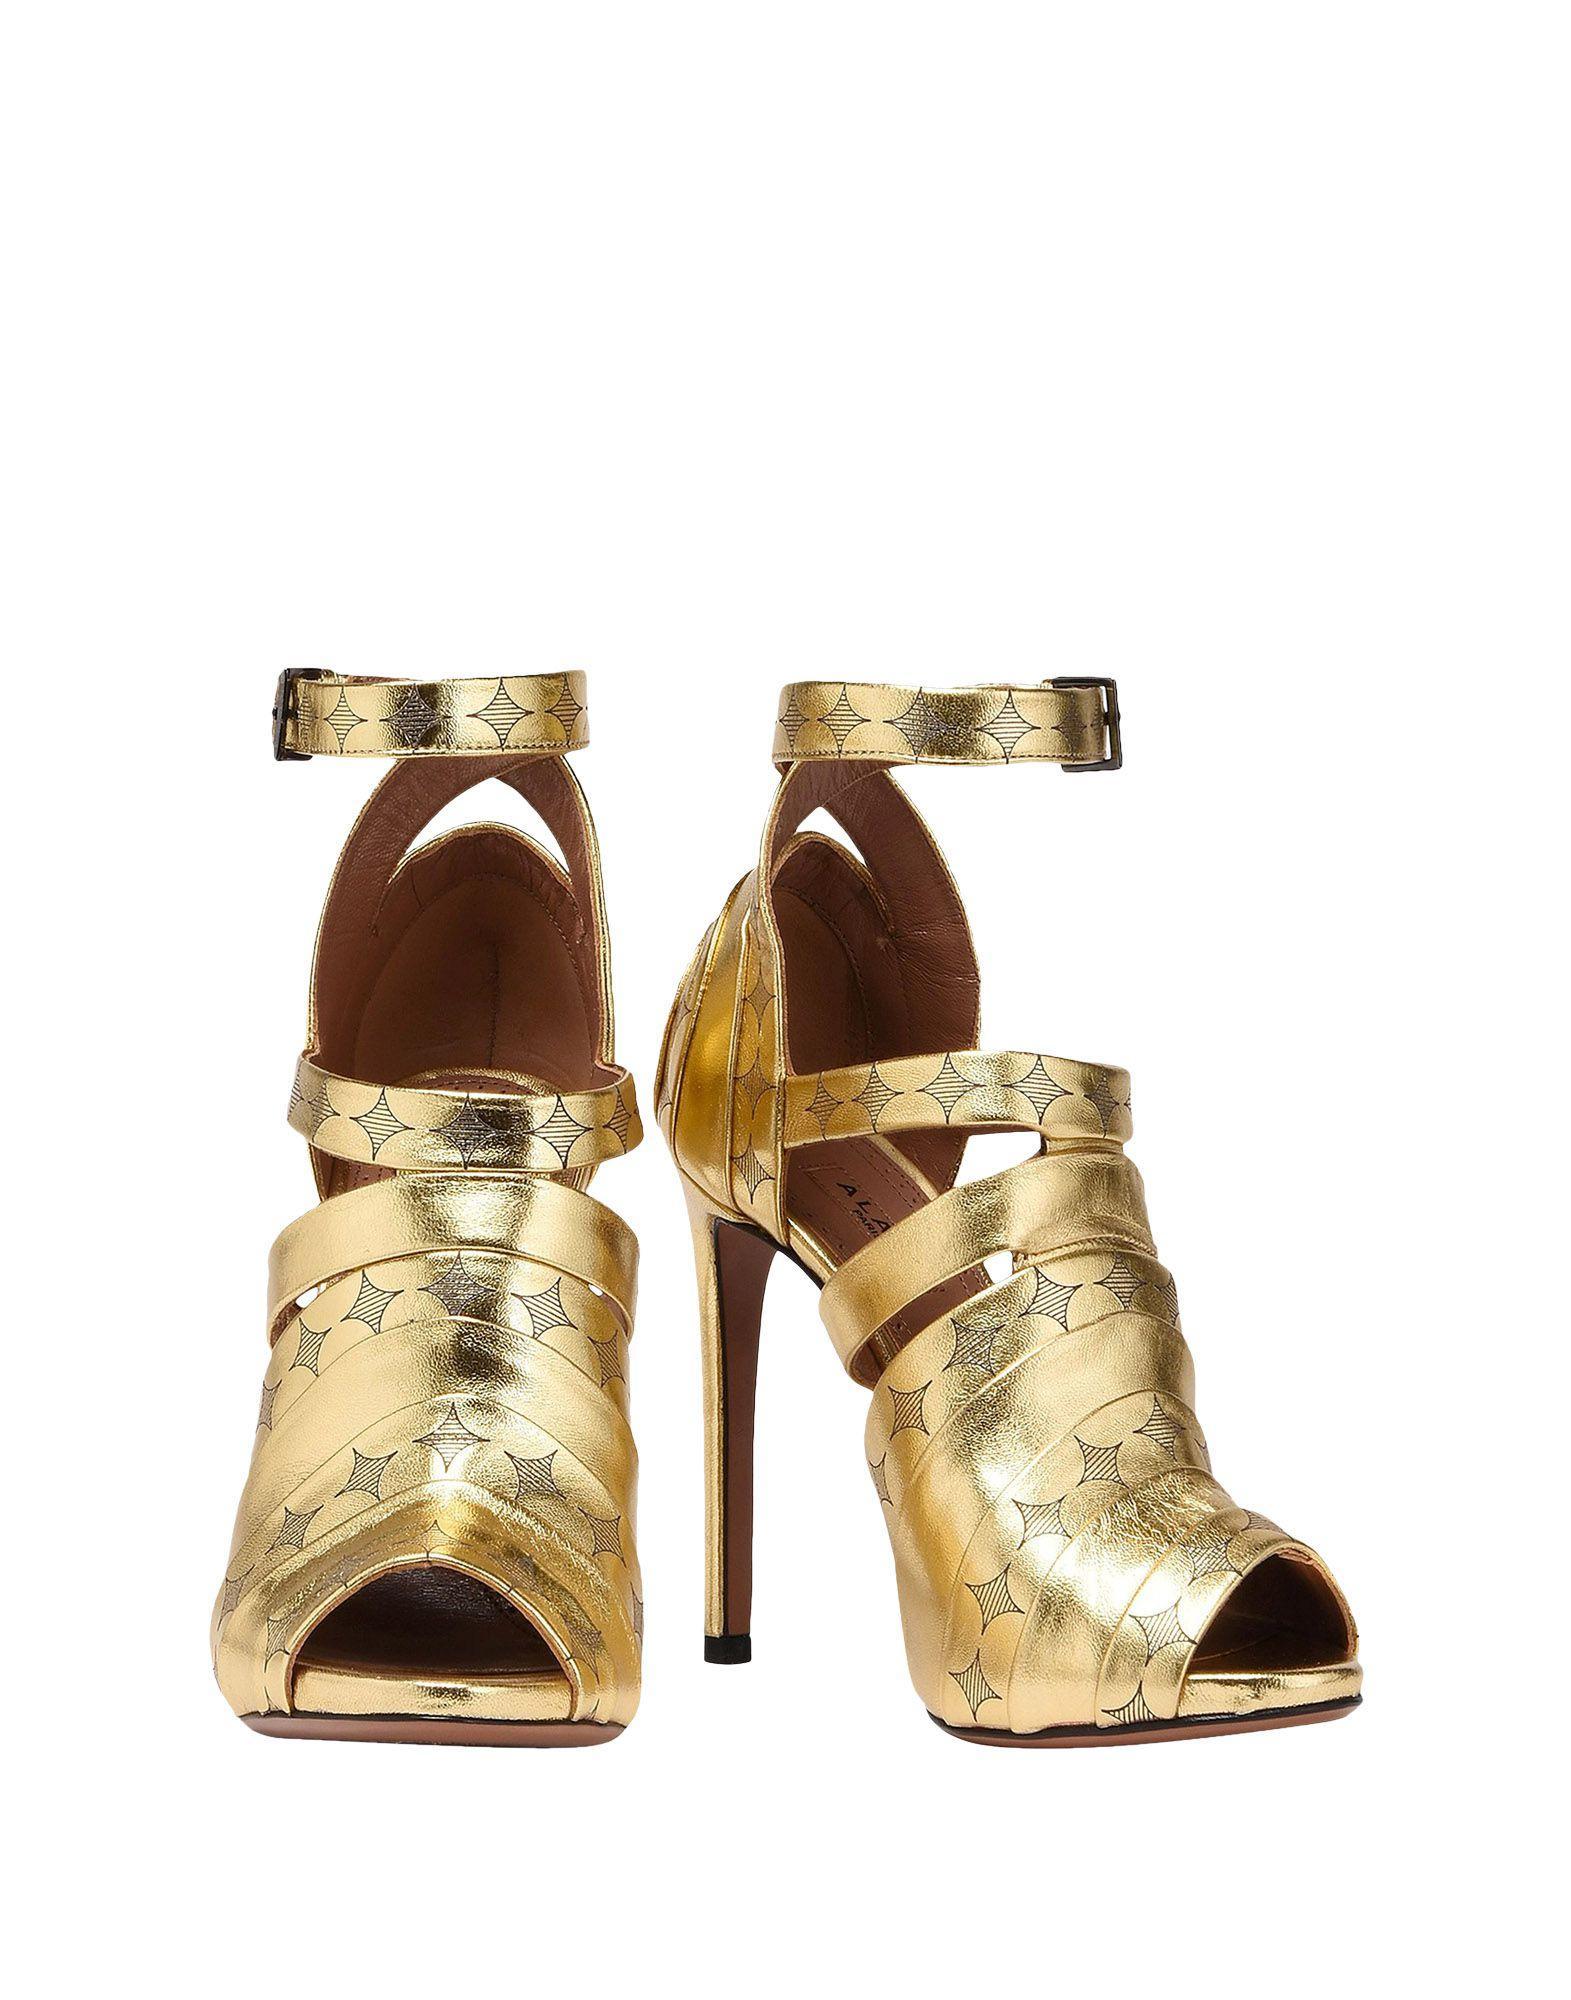 ab432df5964b AlaÏA Sandals In Gold